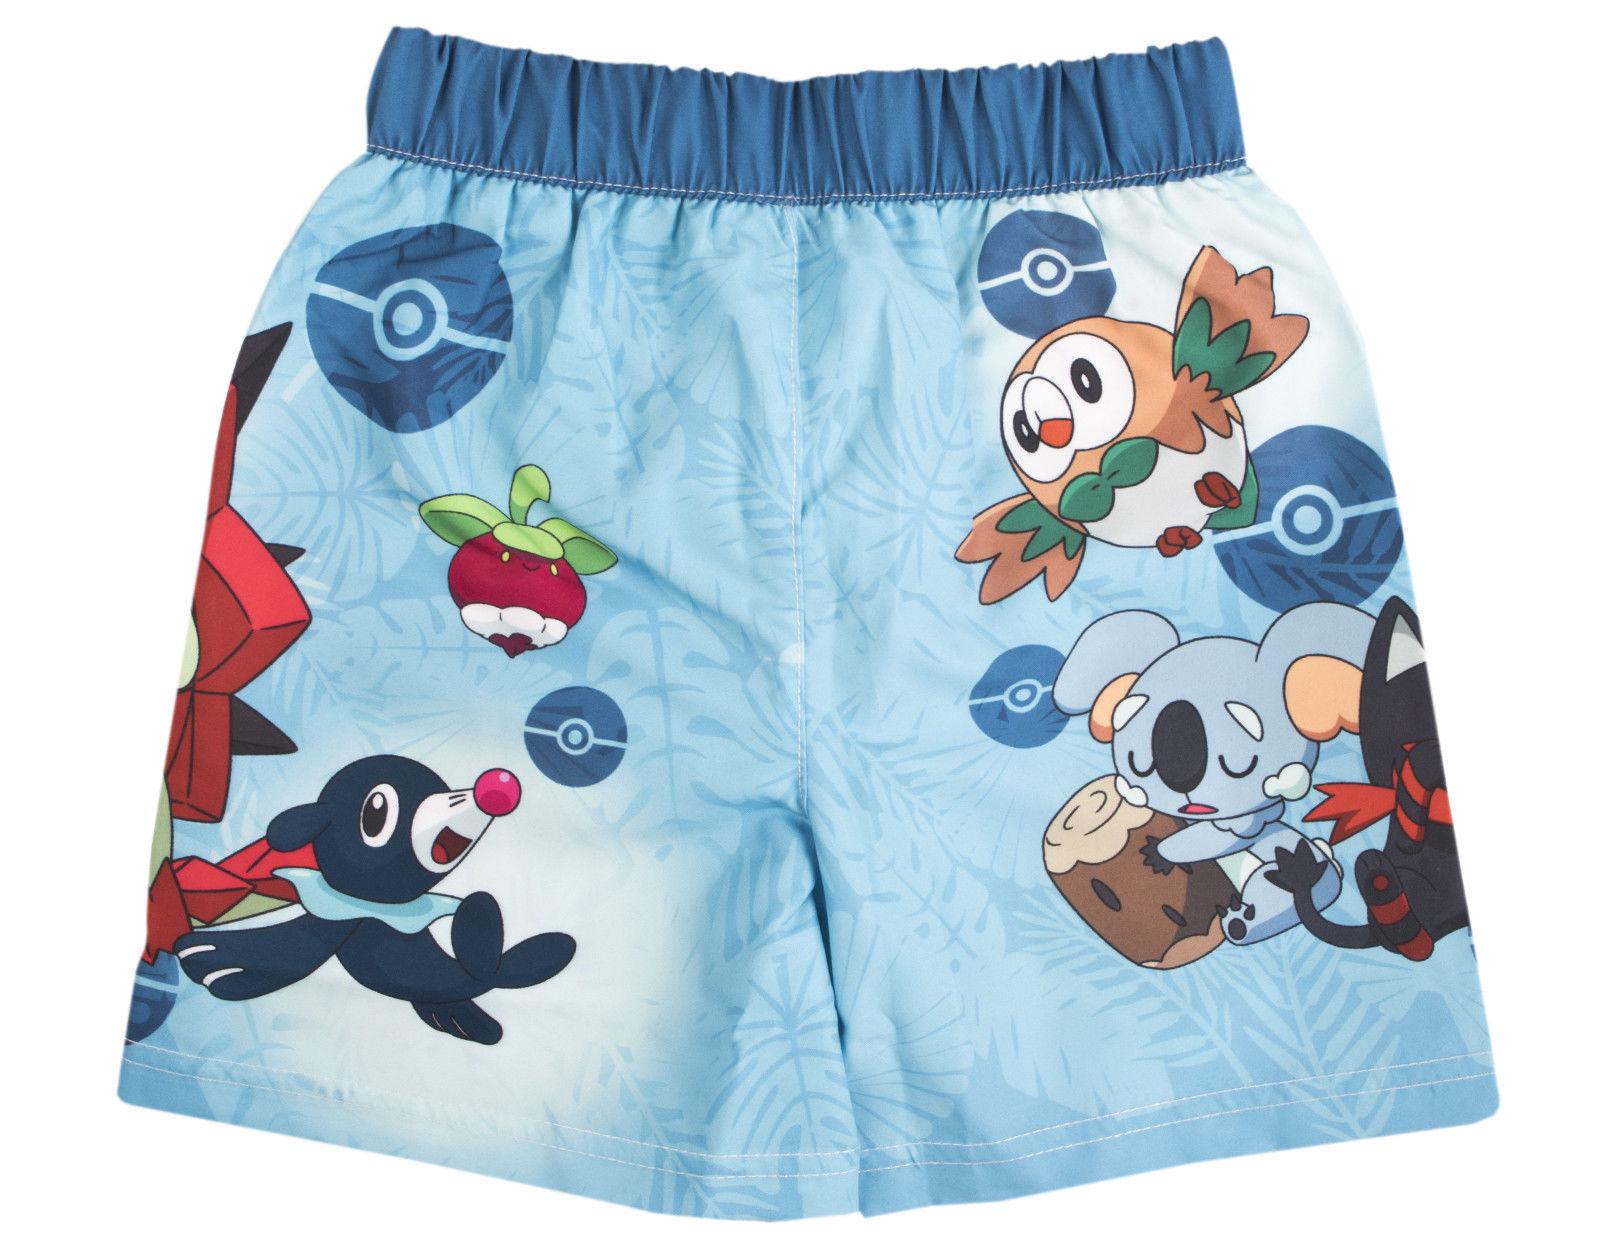 Pokemon: Characters - Swim Shorts (3-4 Years) image